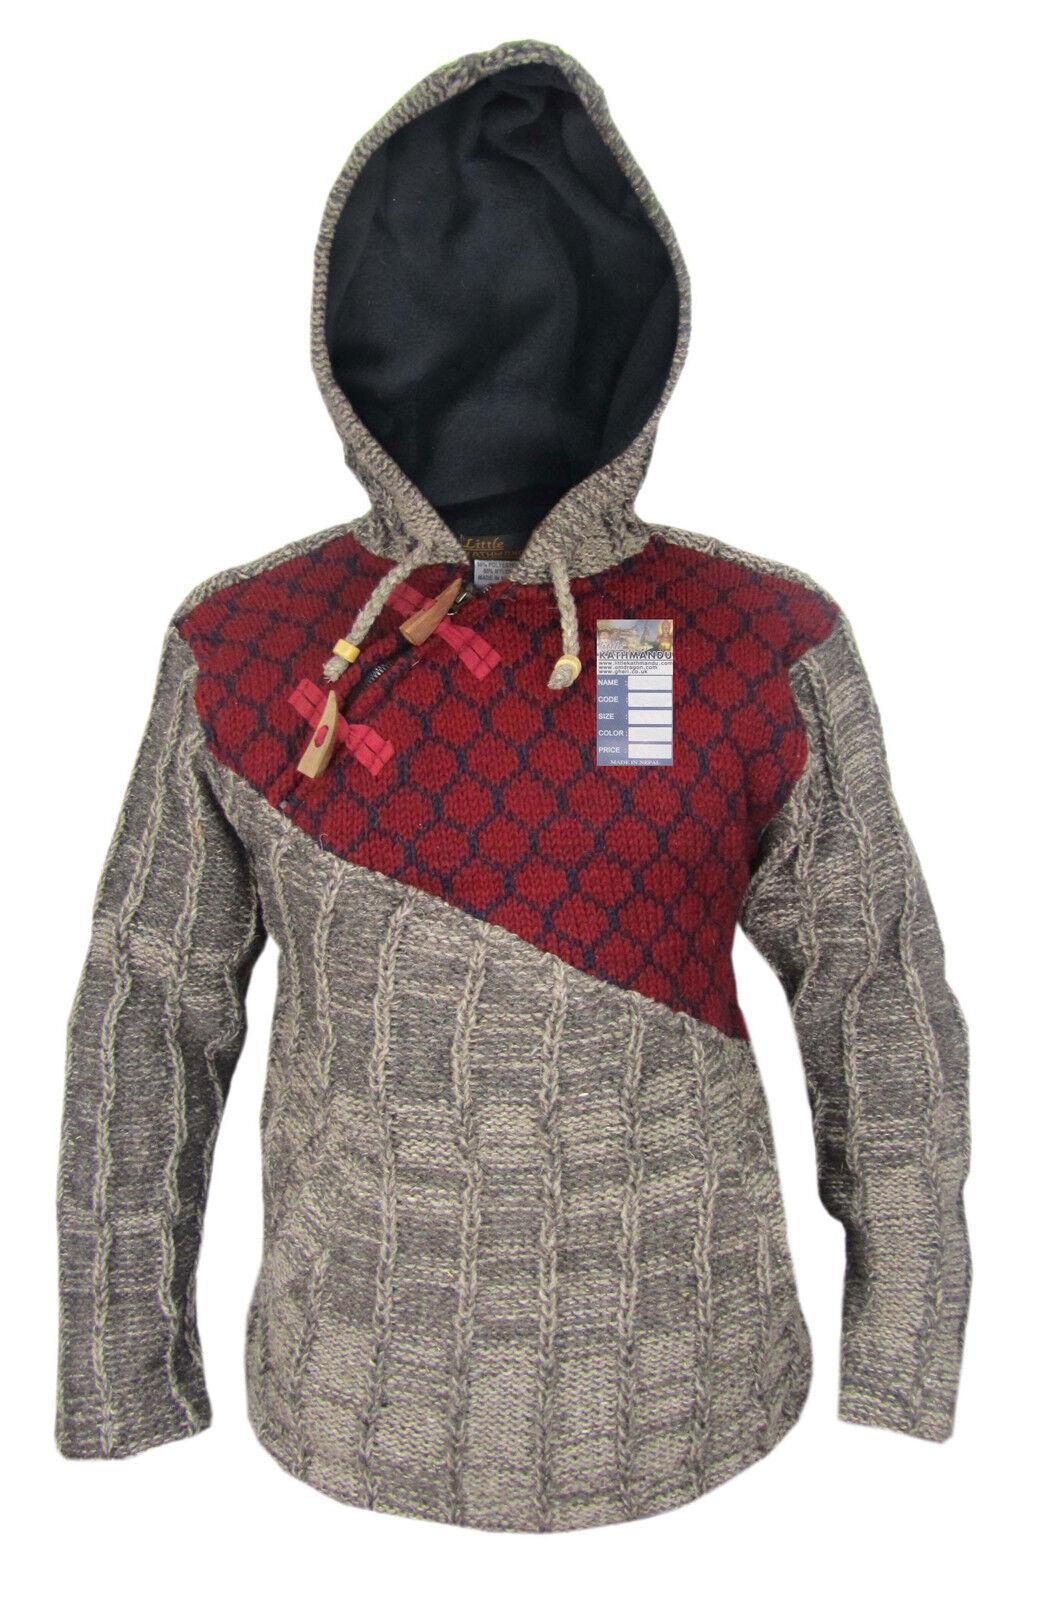 Maroon Mix Cross Zip Ribbed Woolen Patchwork Warm Hippie Boho Jumper Pullover